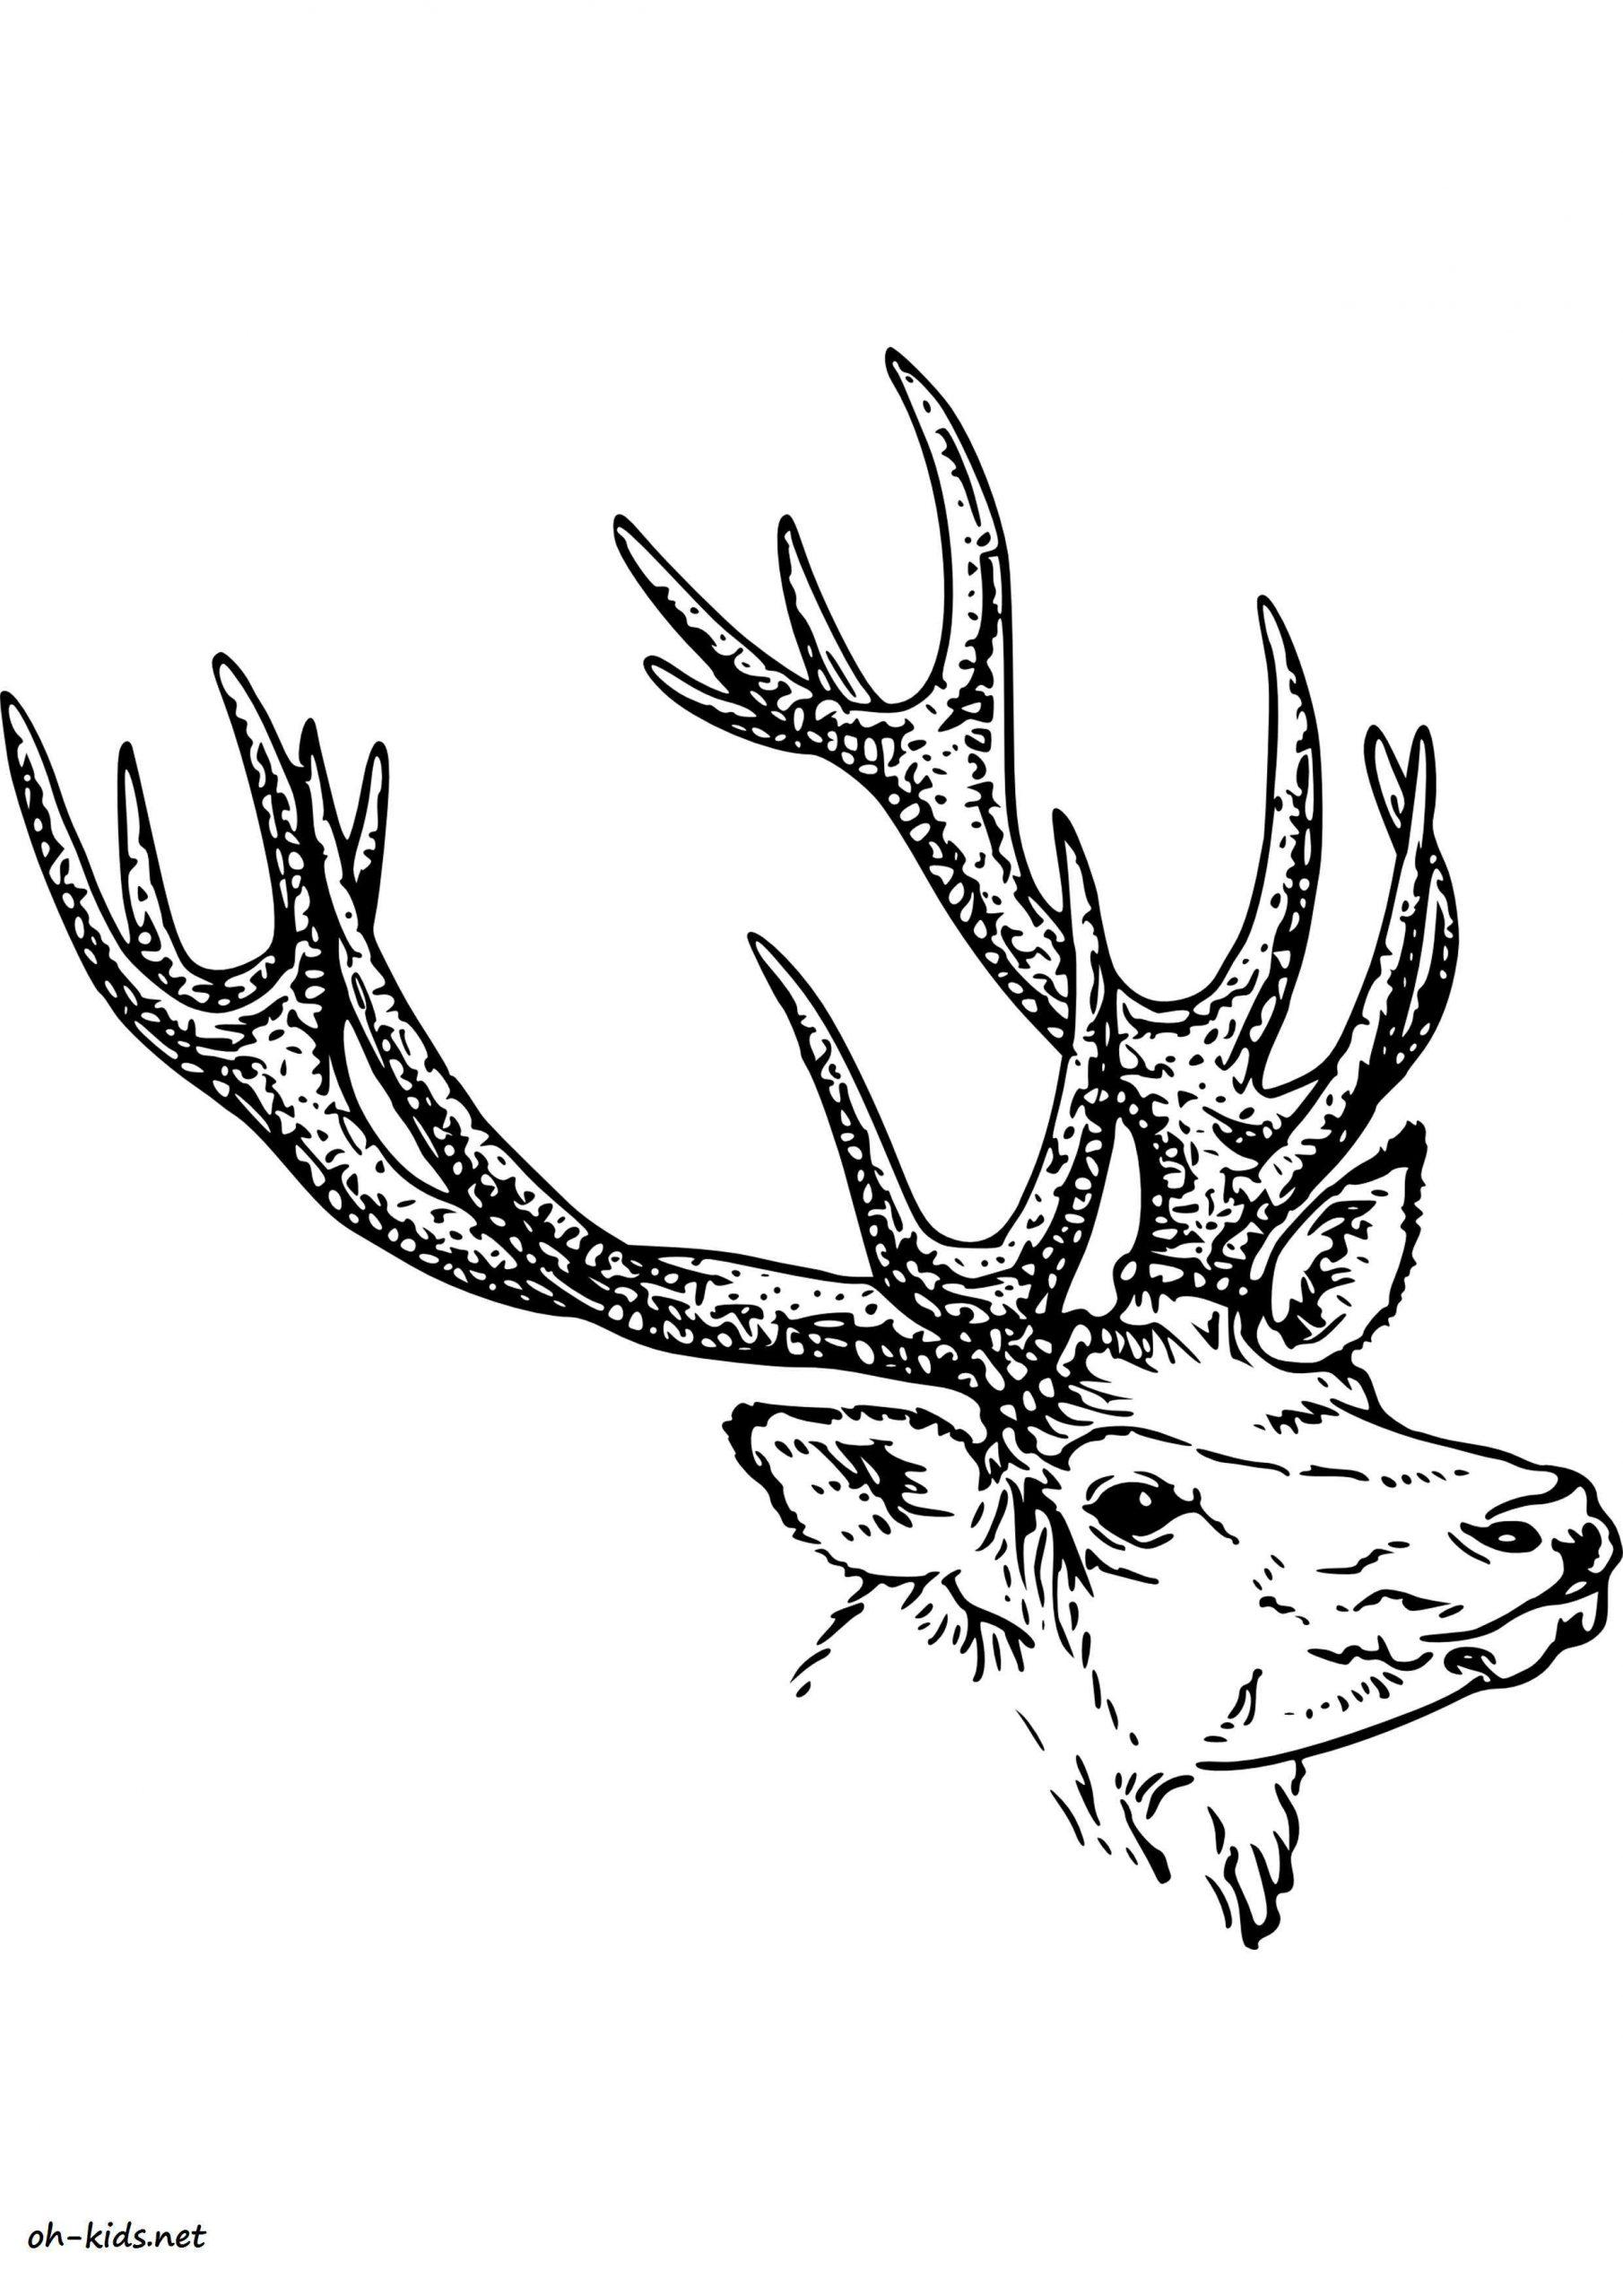 Dessin #1294 - Coloriage Caribou À Imprimer - Oh-Kids dedans Caribou Dessin